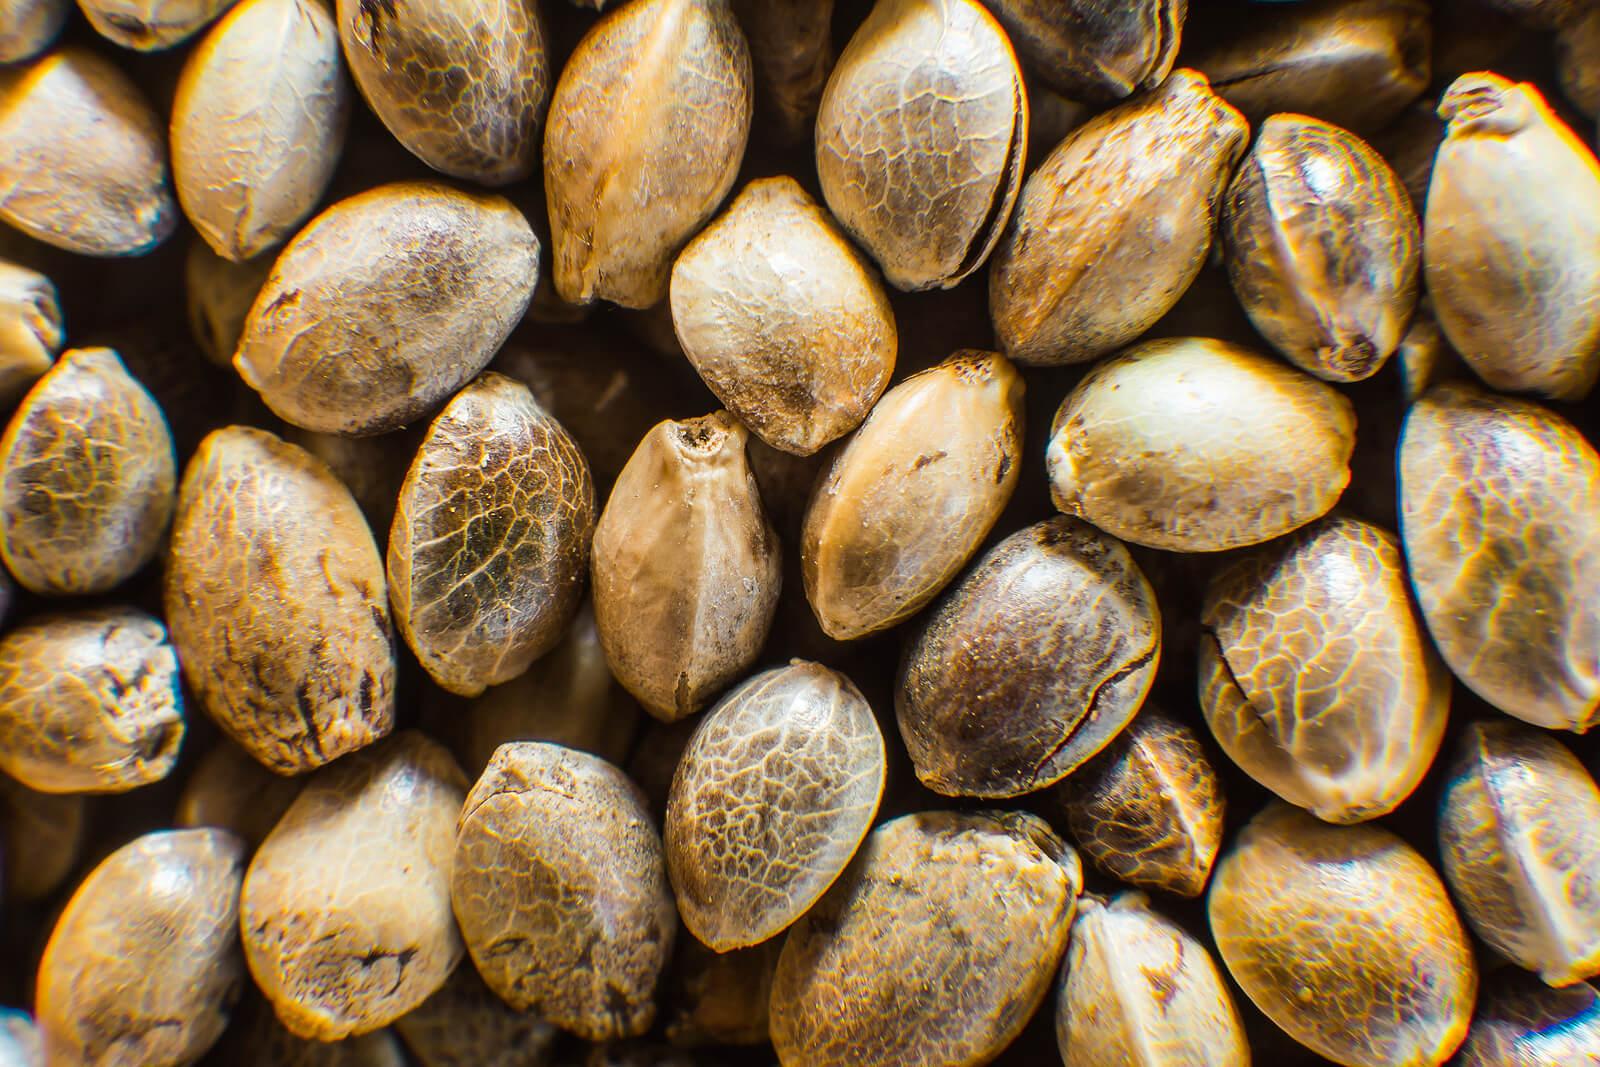 Where To Buy Marijuana Seeds In St. Johns